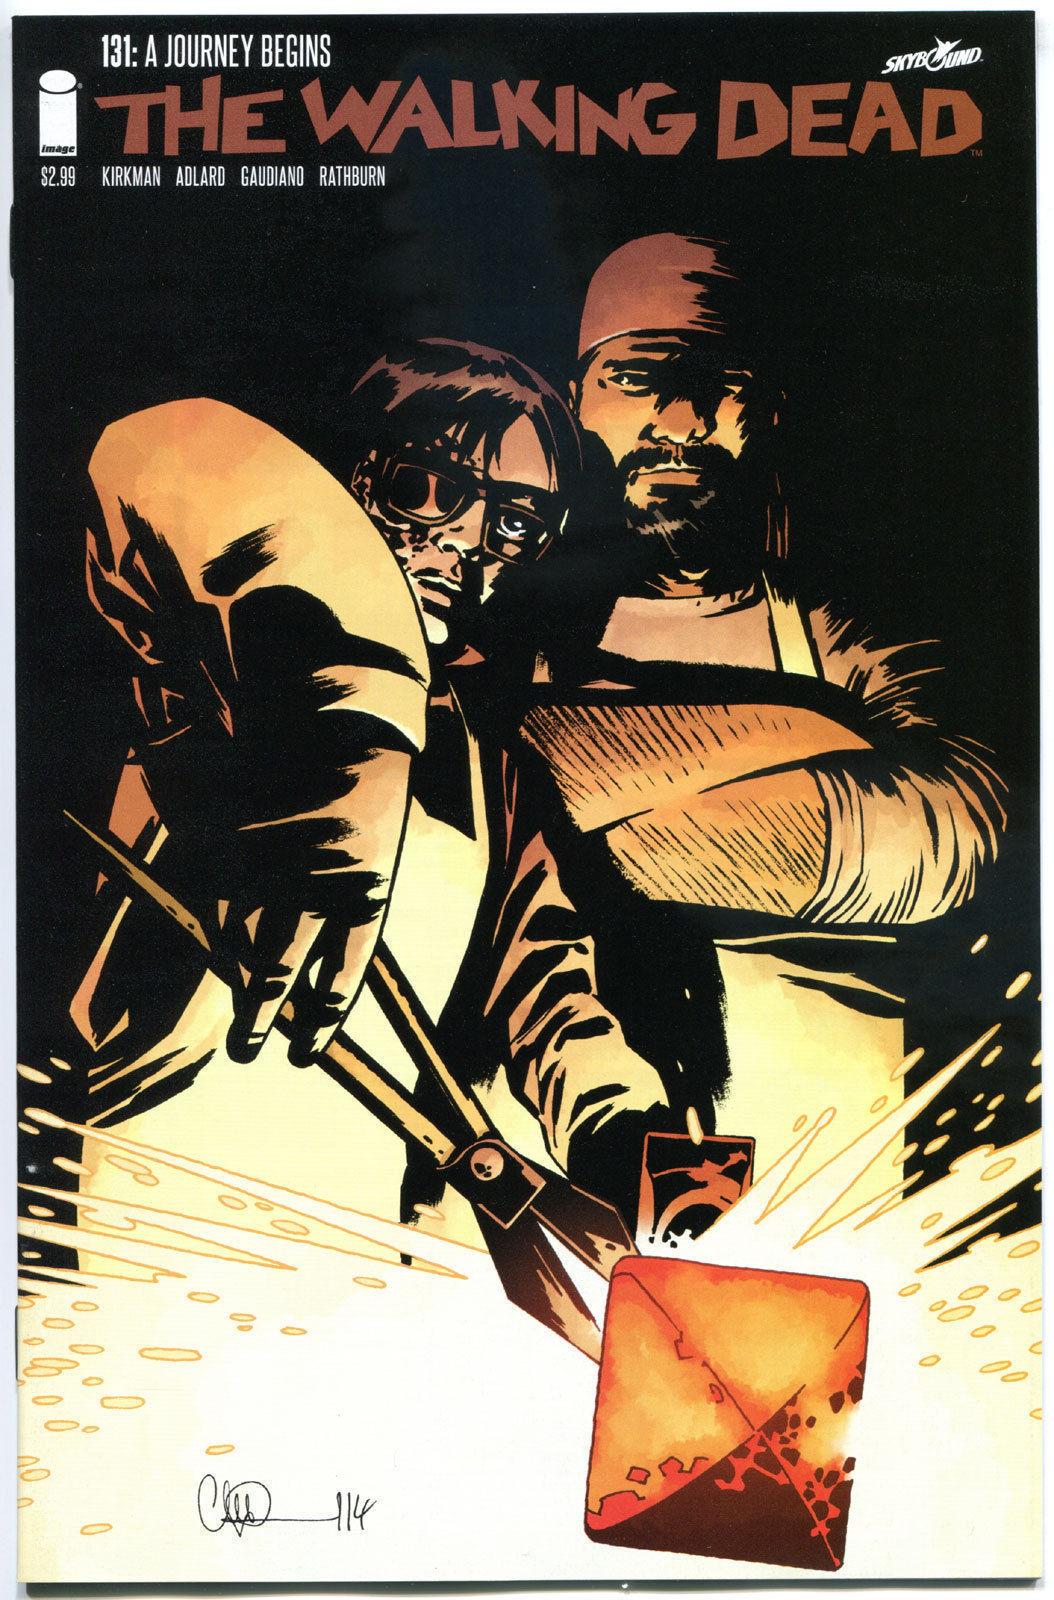 WALKING DEAD #131 1st Print Image Comics Robert Kirkman Skybound NM